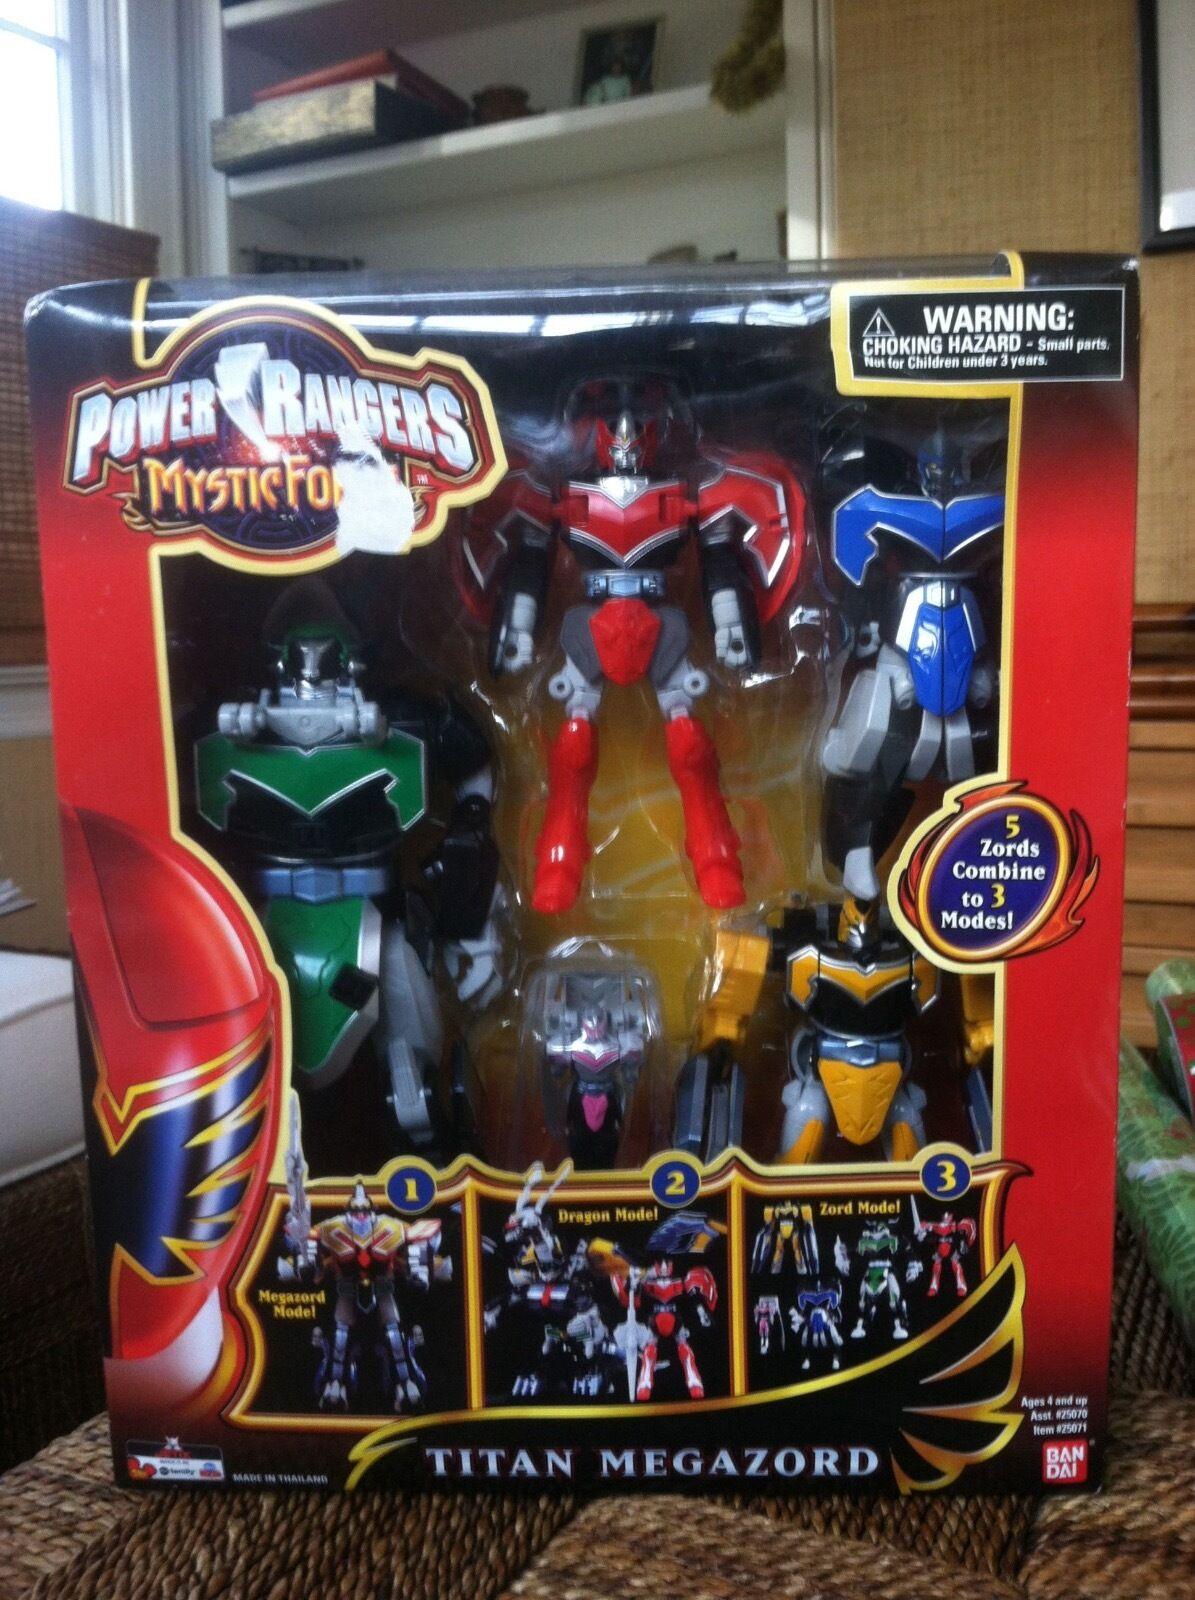 Power Rangers Mystic Force Titan Megazord 5 Zords Combine Bandai - New In Box